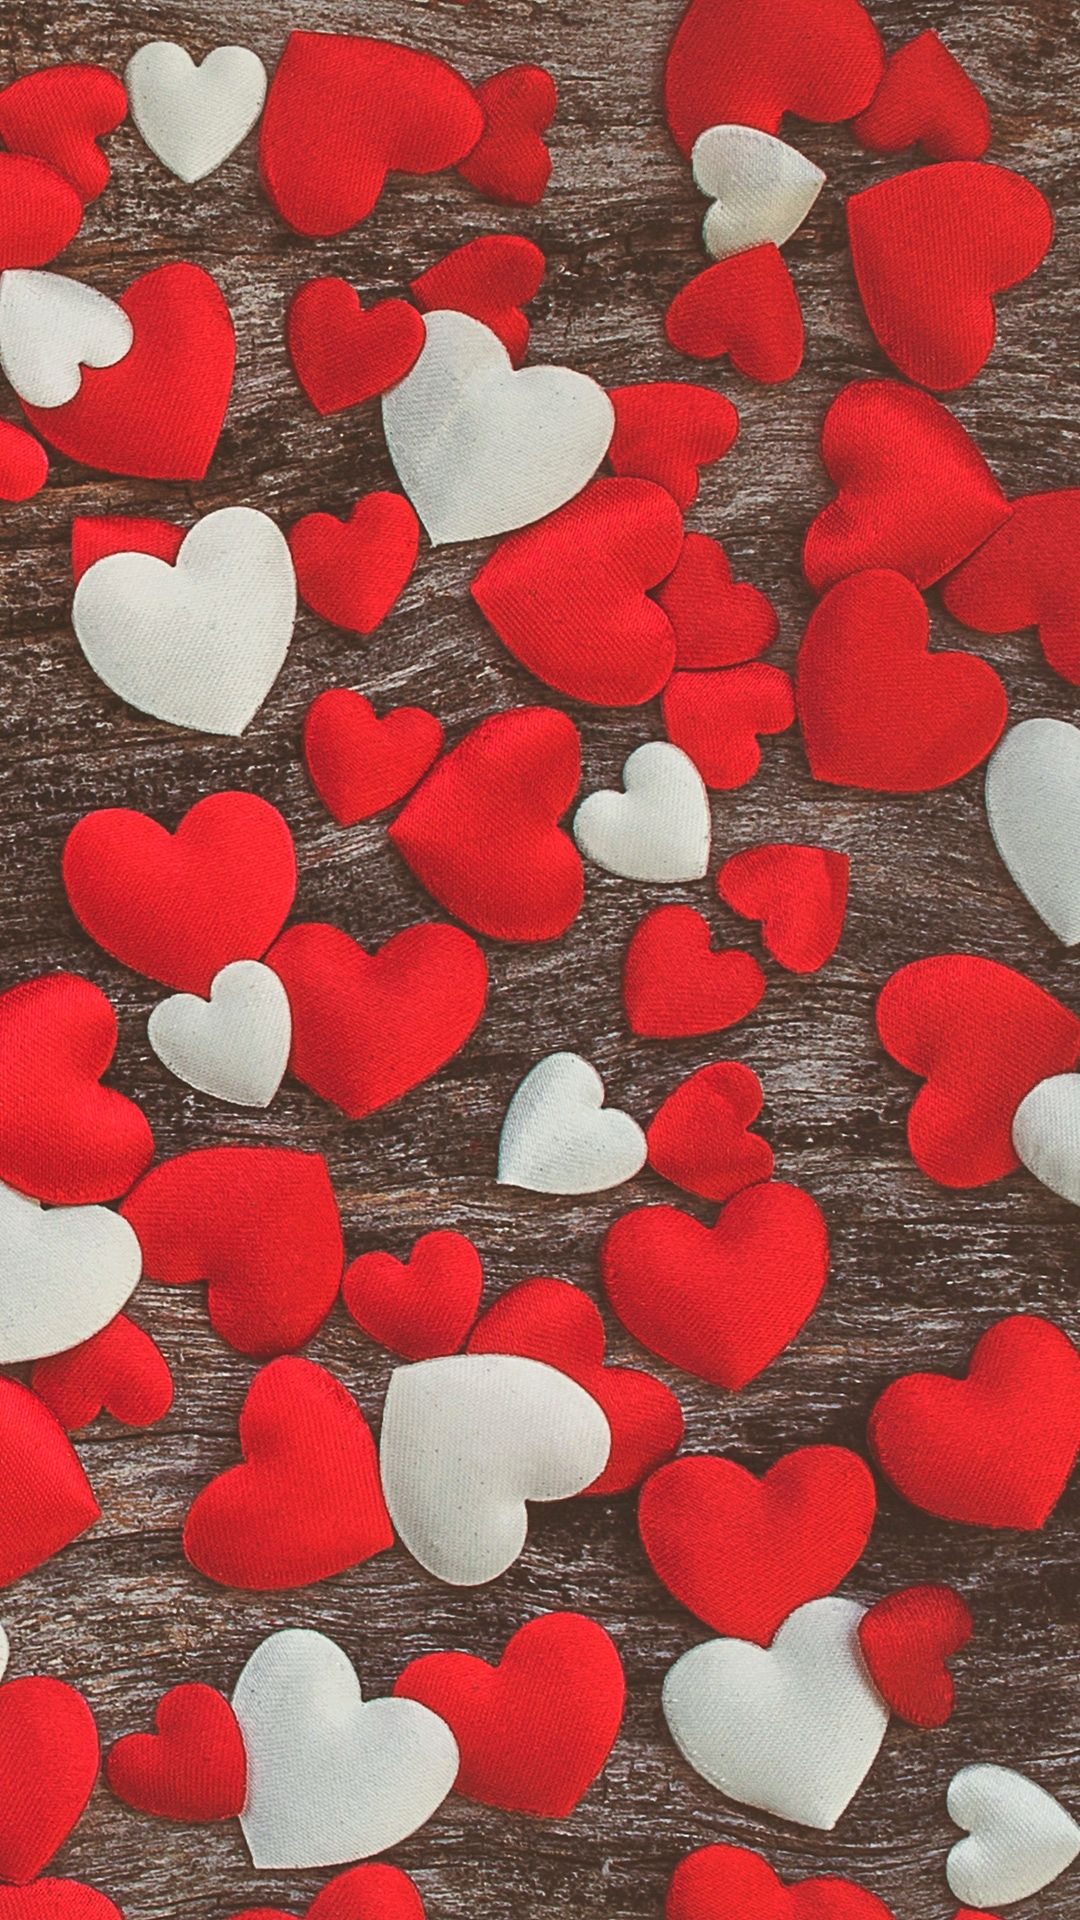 Beautiful Romantic Most Beautiful Love Mobile Wallpapers Valentines Wallpaper Love Wallpaper Heart Wallpaper